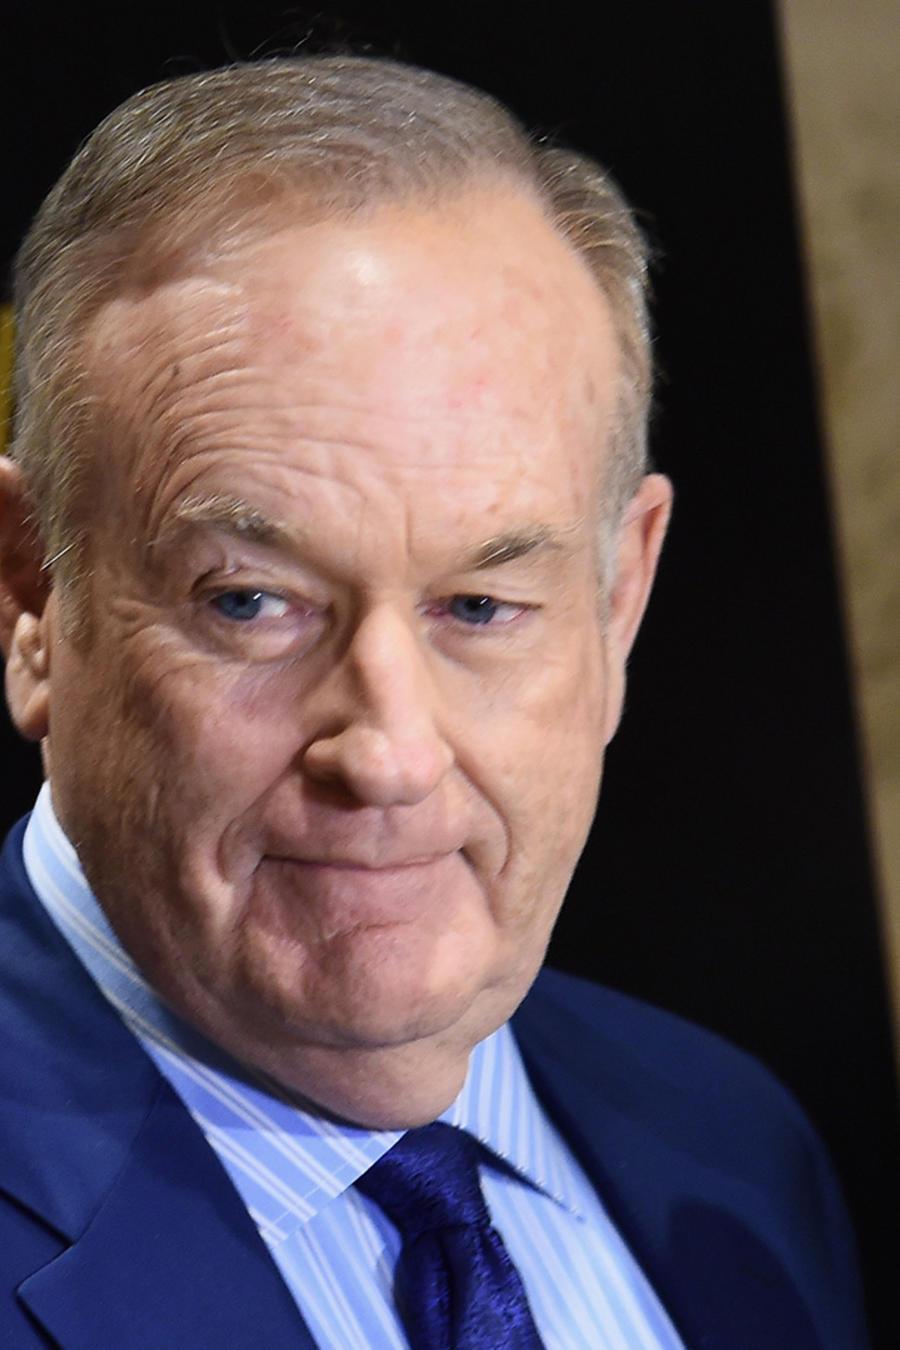 Bill O'Reilly, comentarista de noticias del canal Fox News